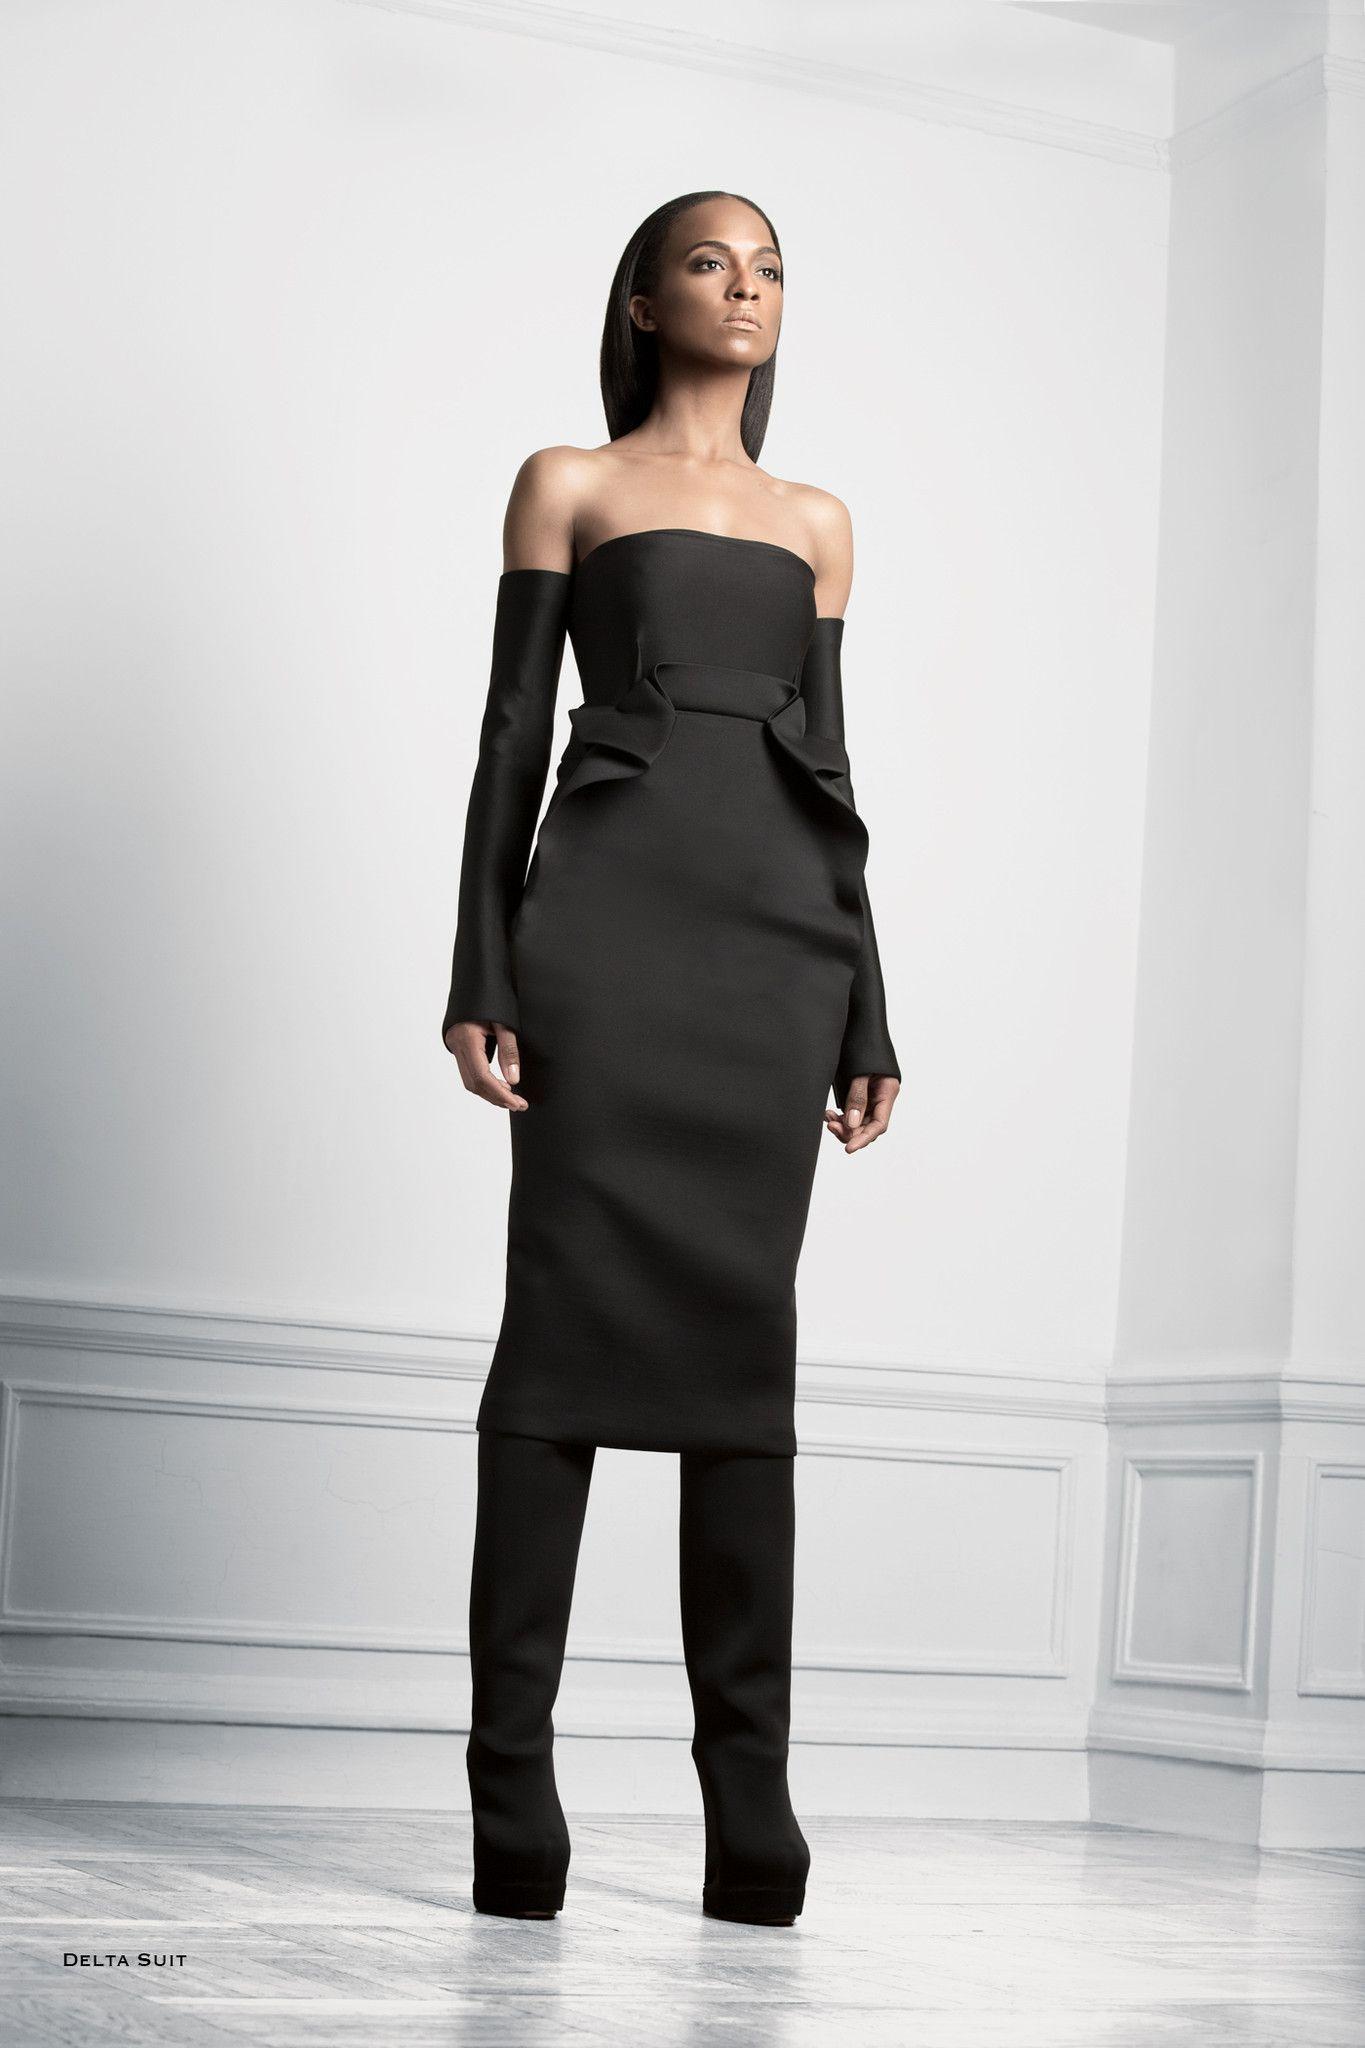 Delta Suit (947.50 Deposit) Strapless dress formal